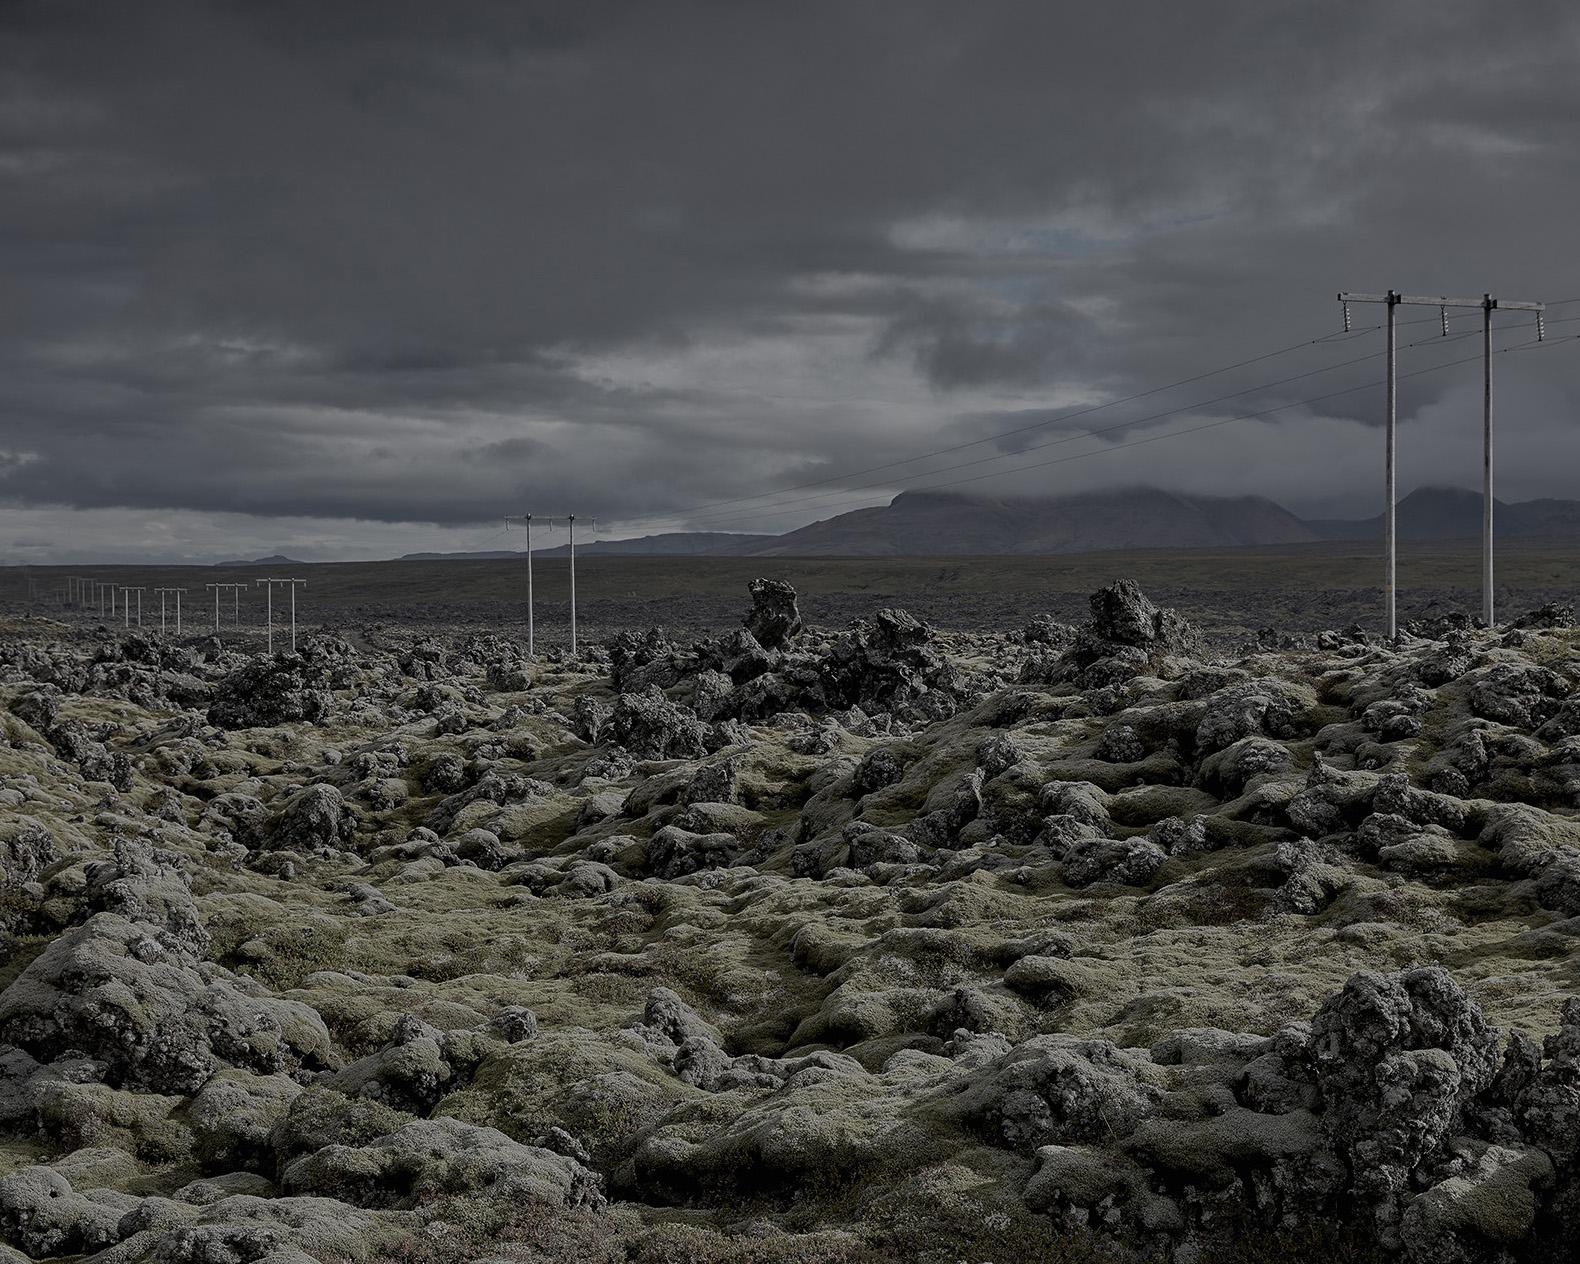 Patrick_Schuttler_Landscape_004.jpg